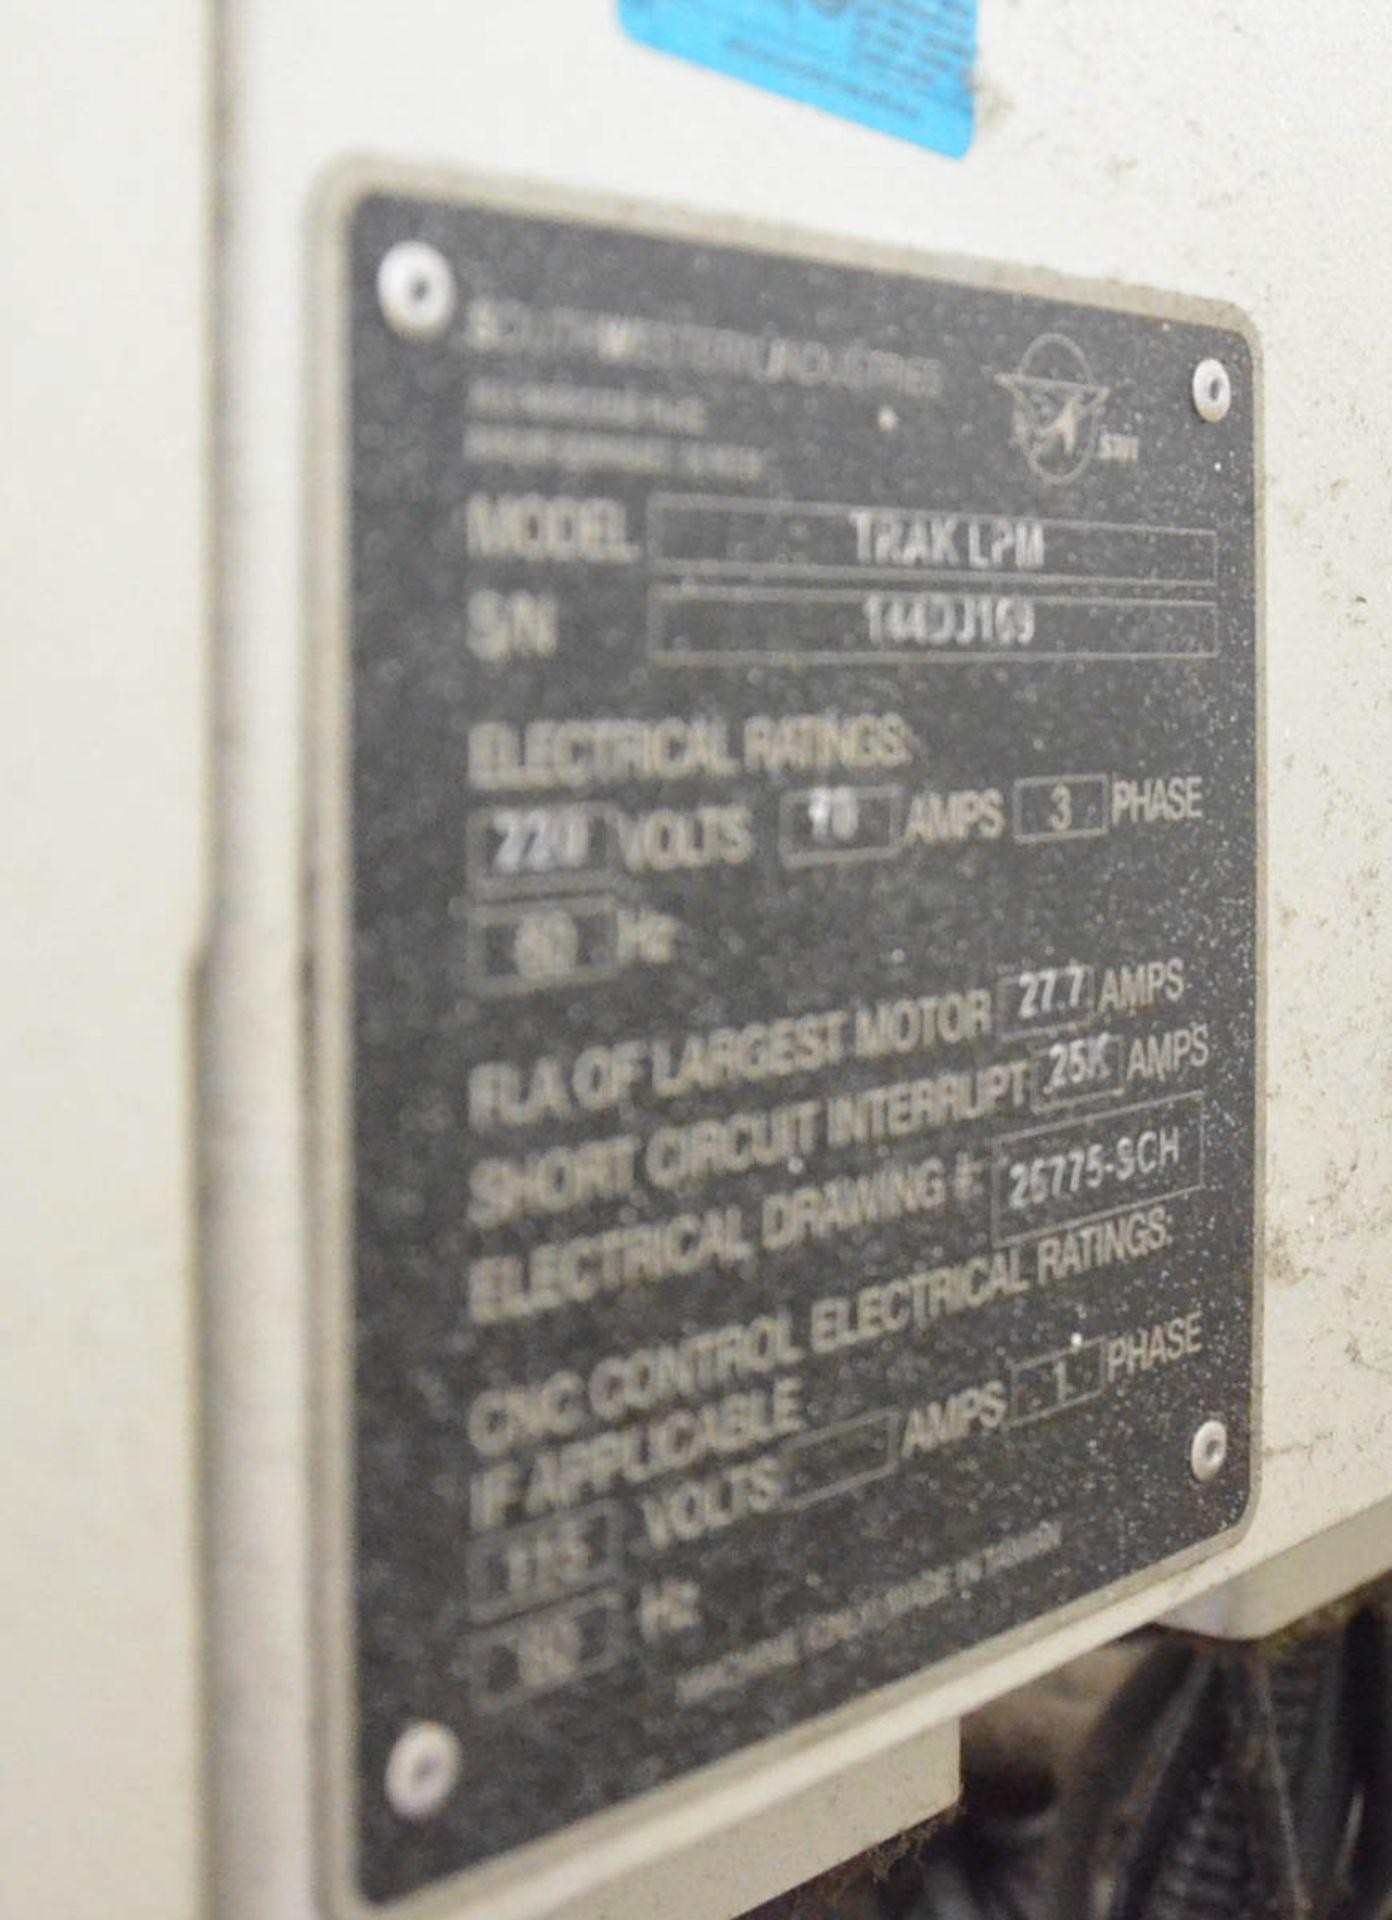 "SWI (2014) TRAK LPM CNC VERTICAL MACHINING CENTER WITH PROTO TRAK PMX CNC CONTROL, 19.5"" X 35.5"" - Image 4 of 9"